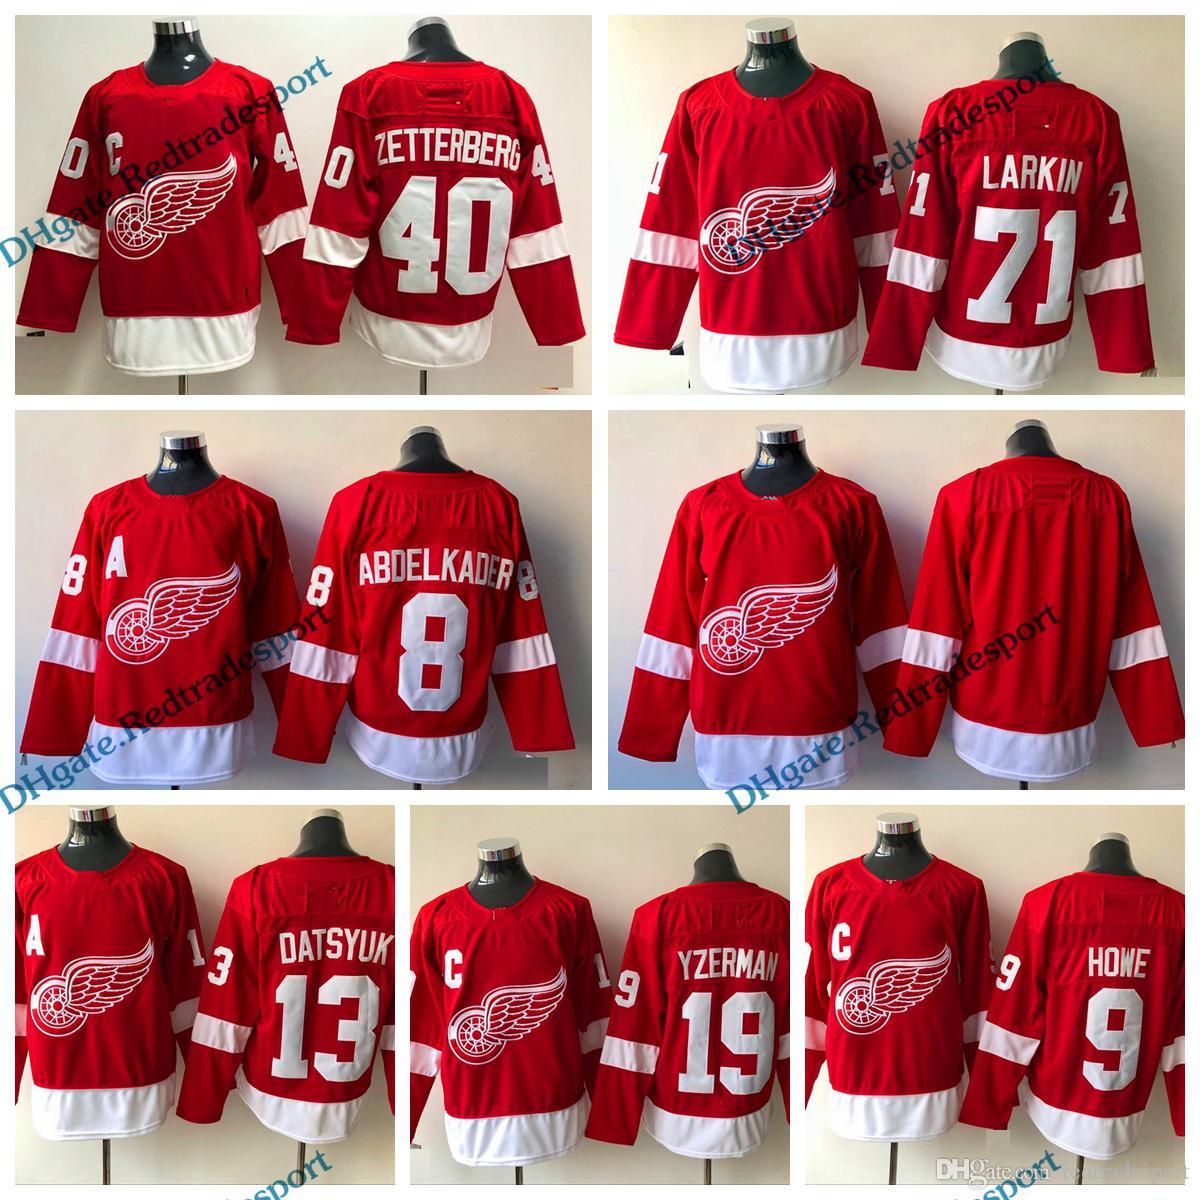 2019 2018 Detroit Red Wings 8 Justin Abdelkader 71 Dylan Larkin 40 Henrik  Zetterberg 9 Gordie Howe Steve Yzerman 13 Pavel Datsyuk Hockey Jerseys From  ... dfd98bb29